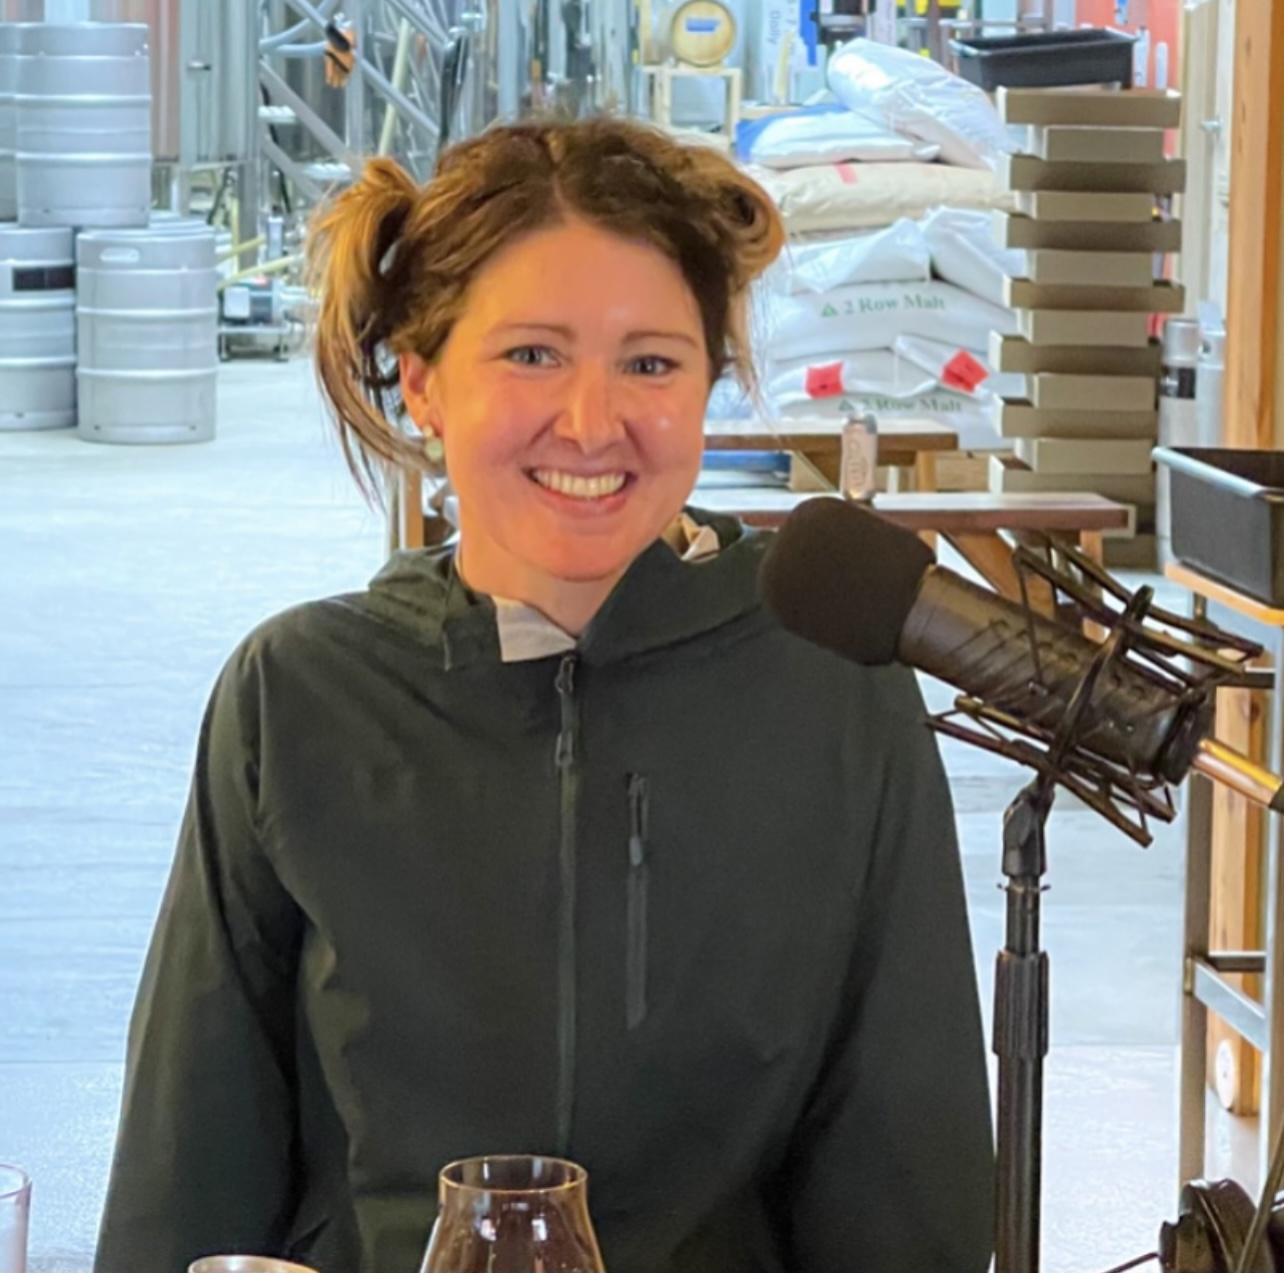 Sara Szymanski Threshold Brewing & Blending – Craft Beer Podcast Episode 130 by Steven Shomler